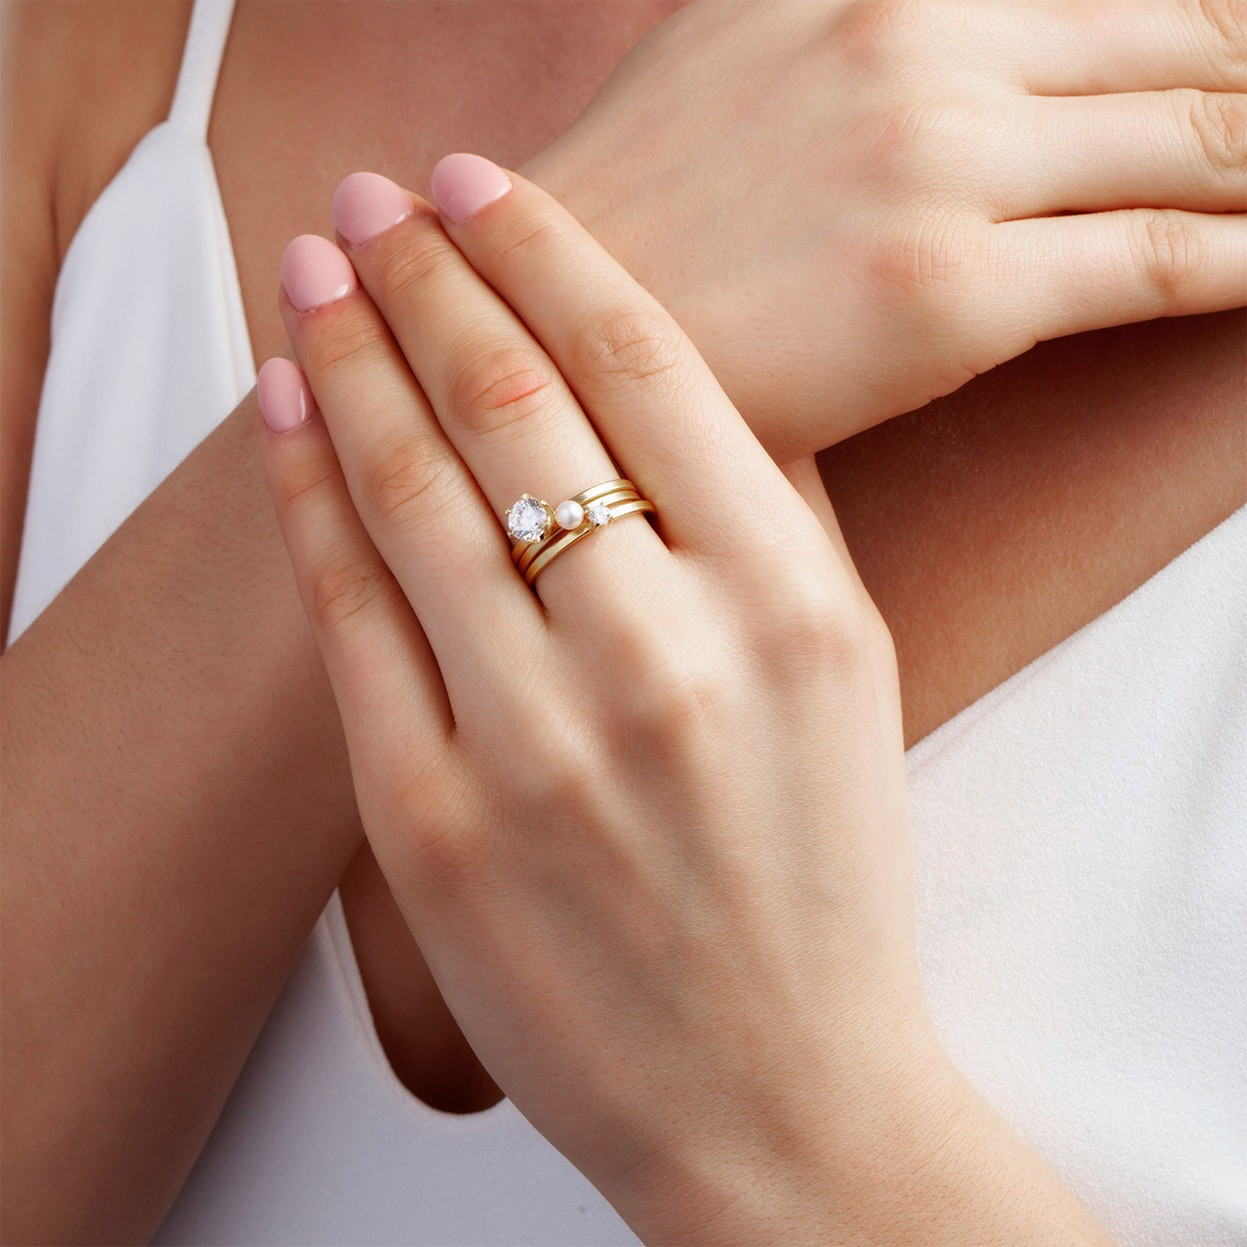 Srebrny pierścionek z cyrkonią 6mm My RING™ 925